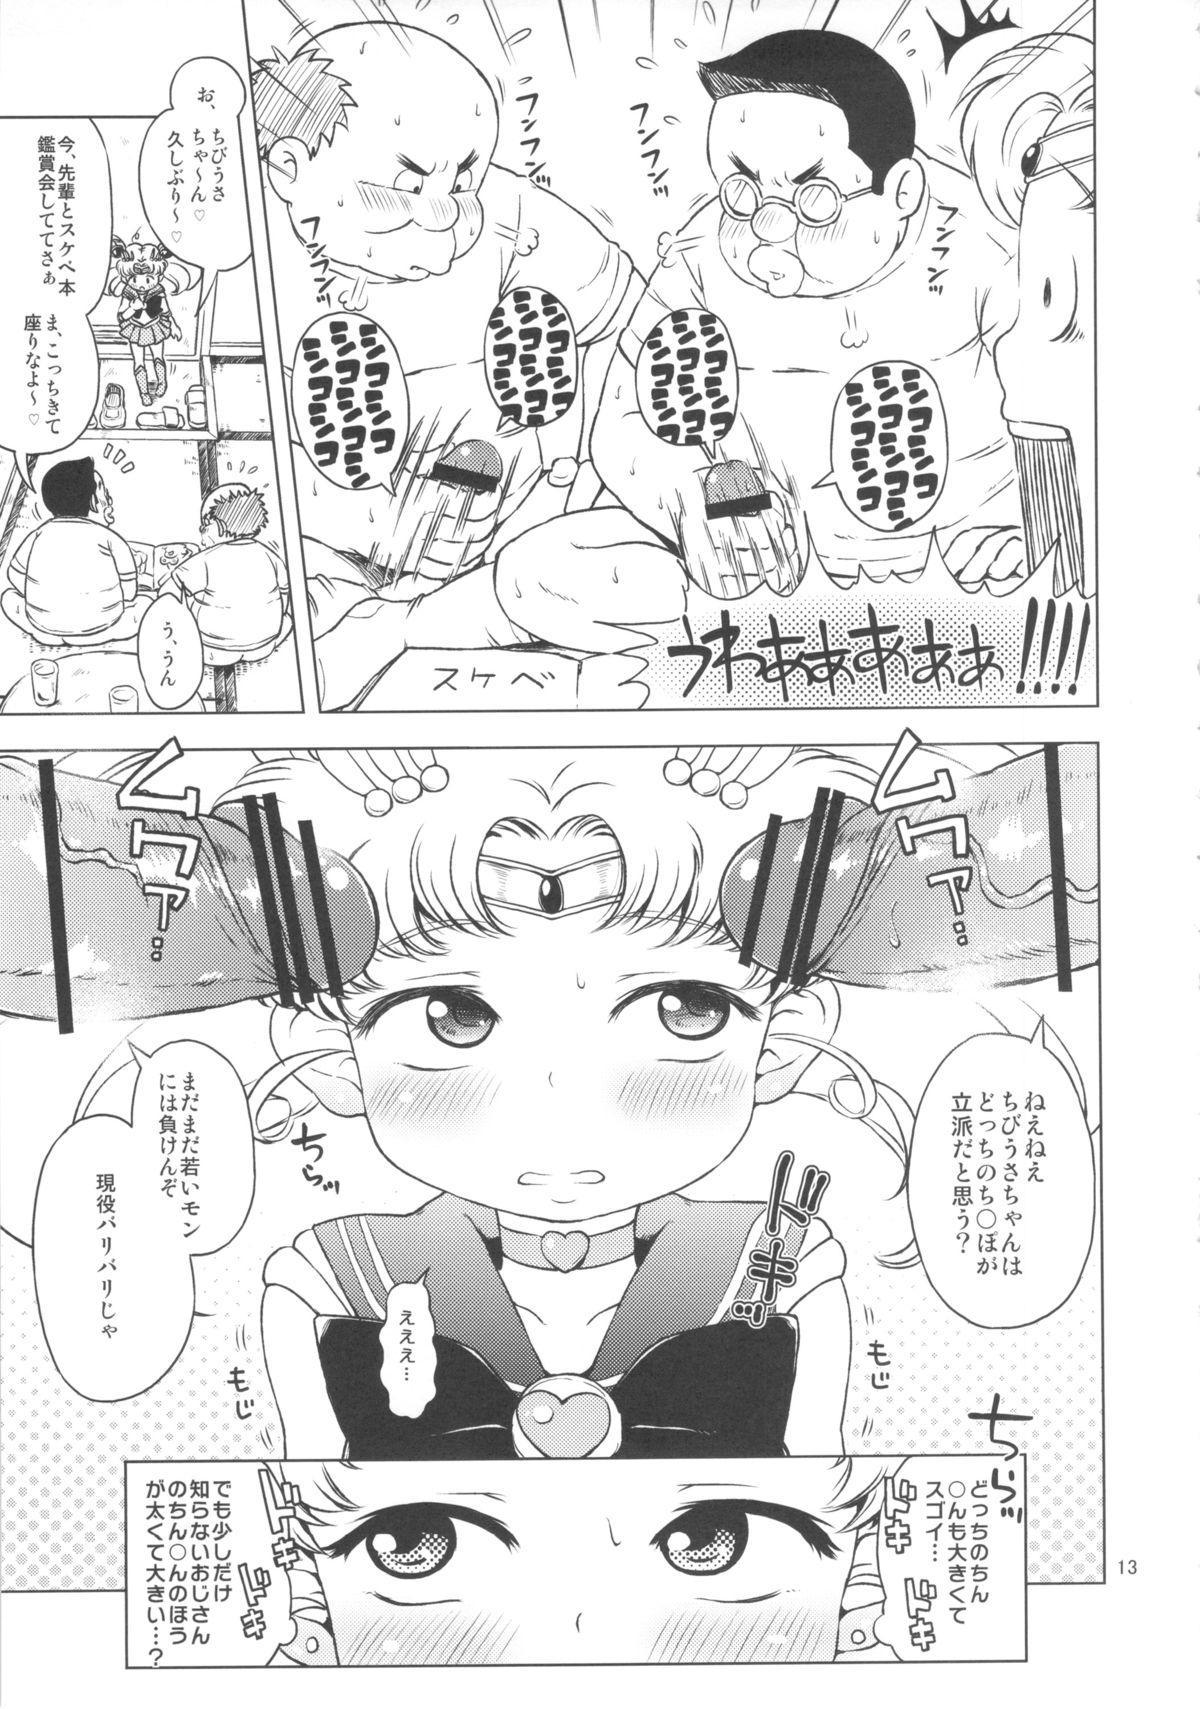 Chibiusa no Himitsu Diary 11